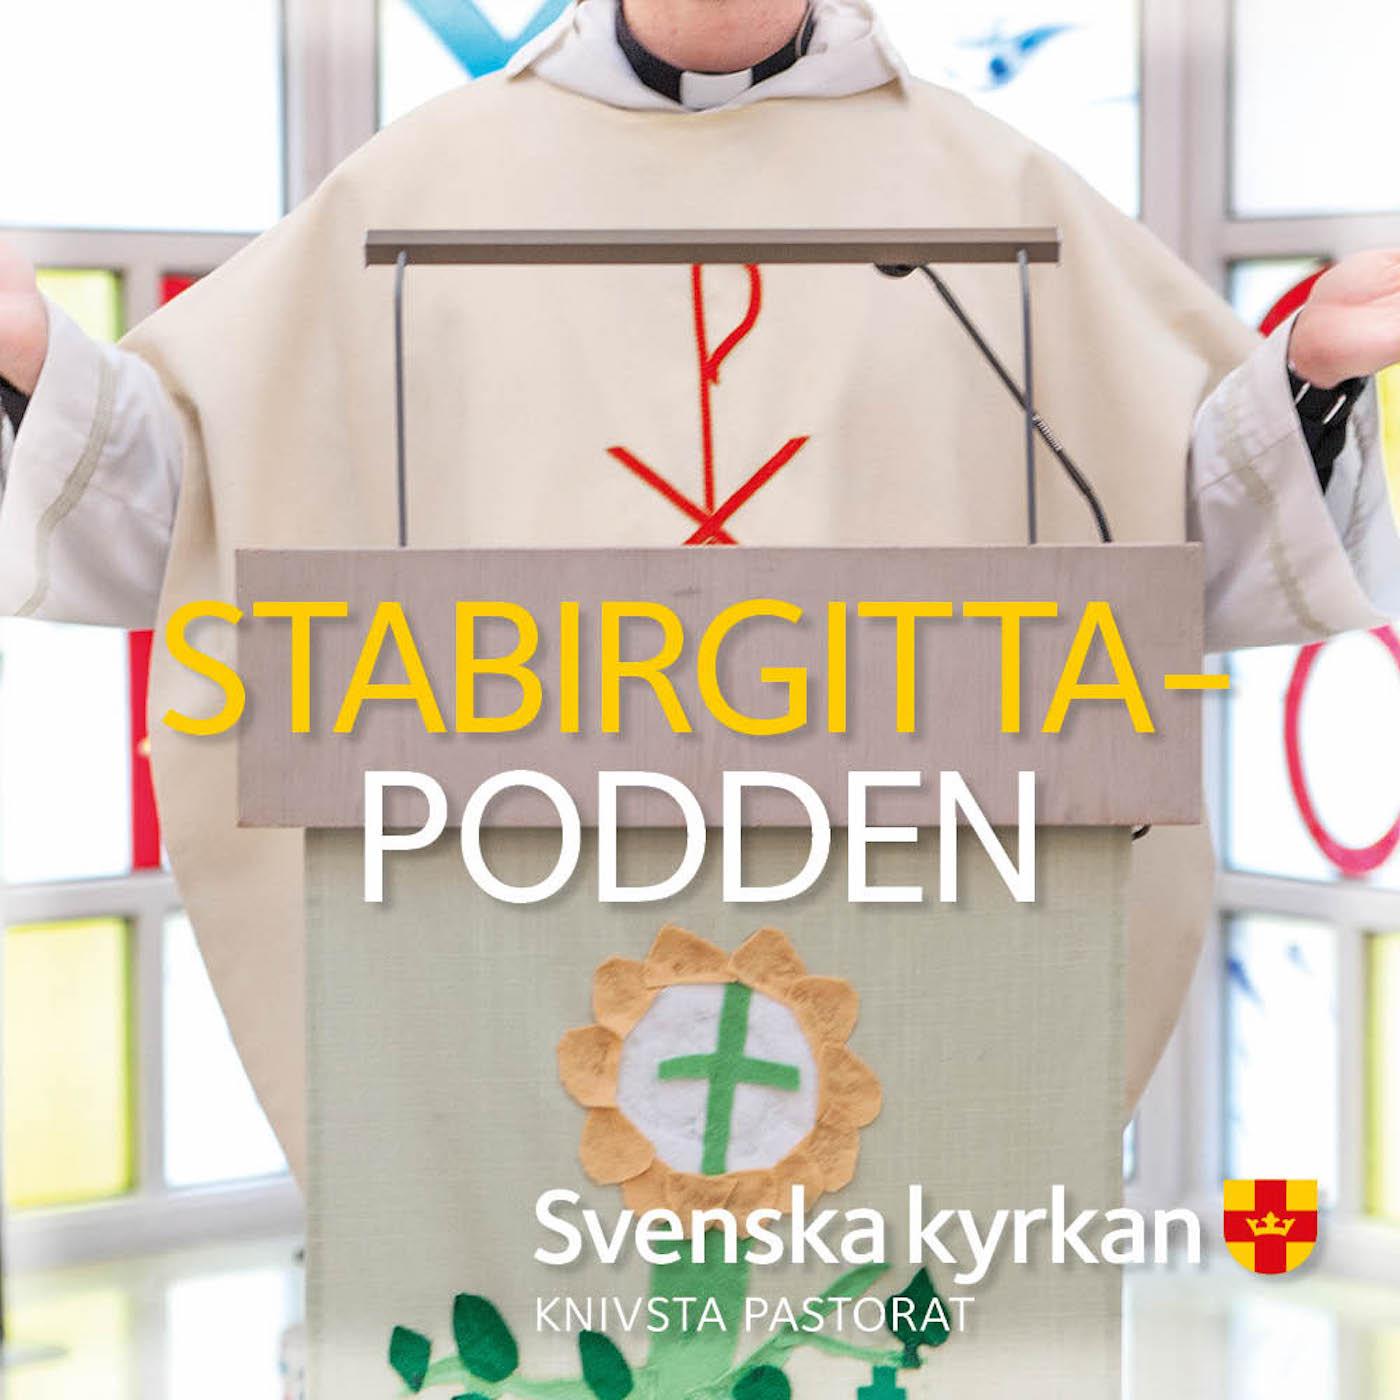 Sankta Birgitta-podden